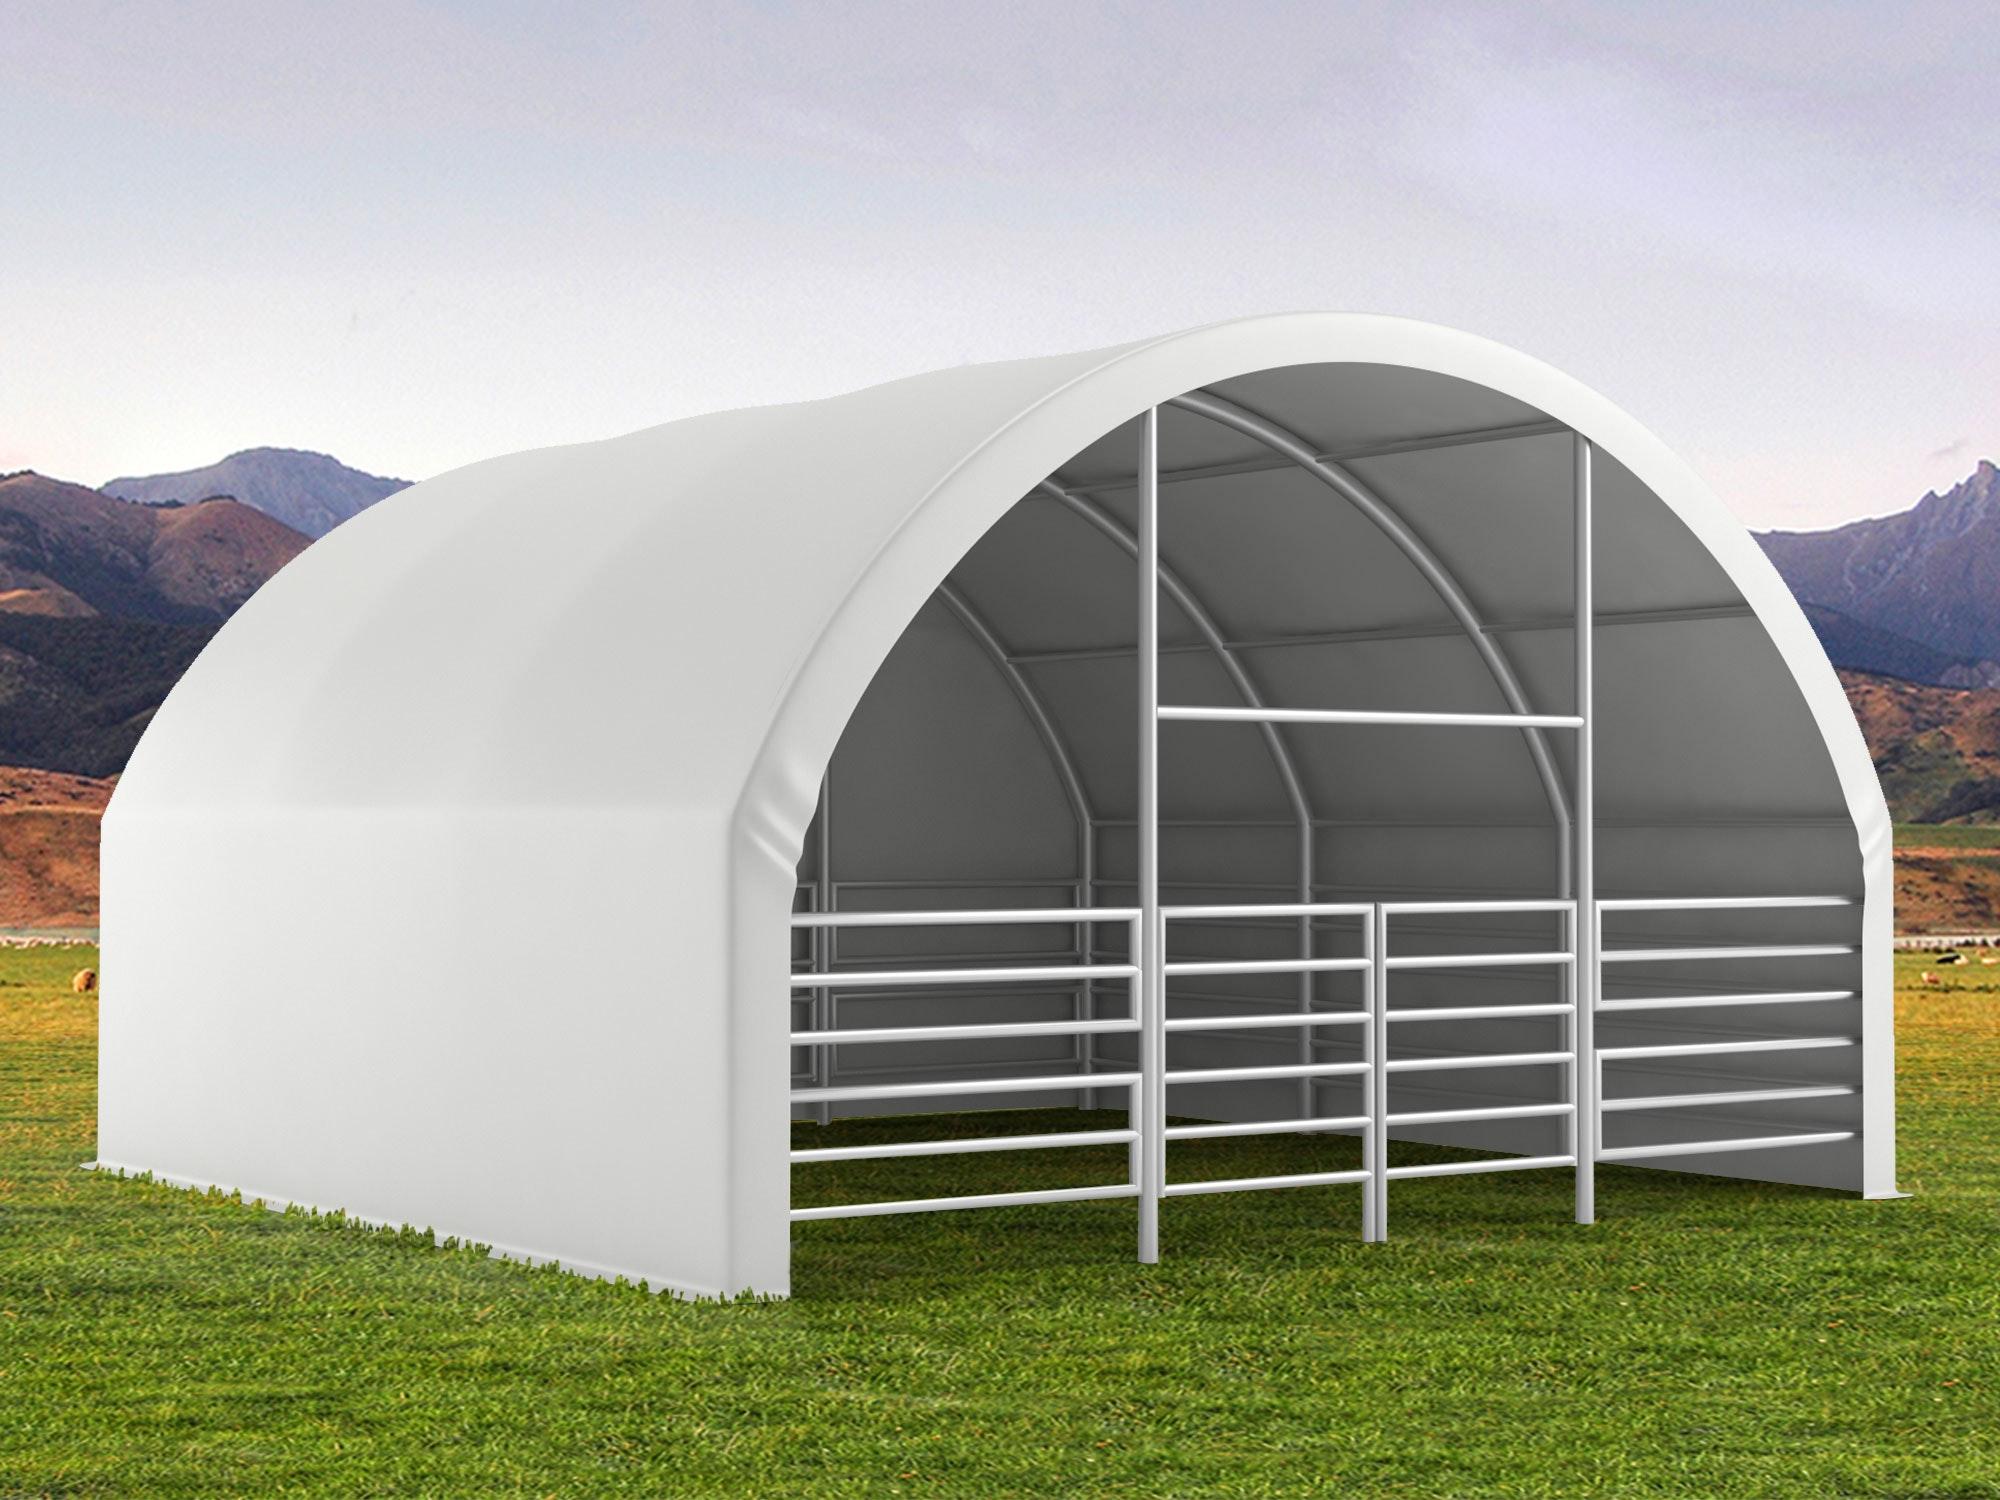 Livestock & Utility Shelter 6m x 6m x 3.7m